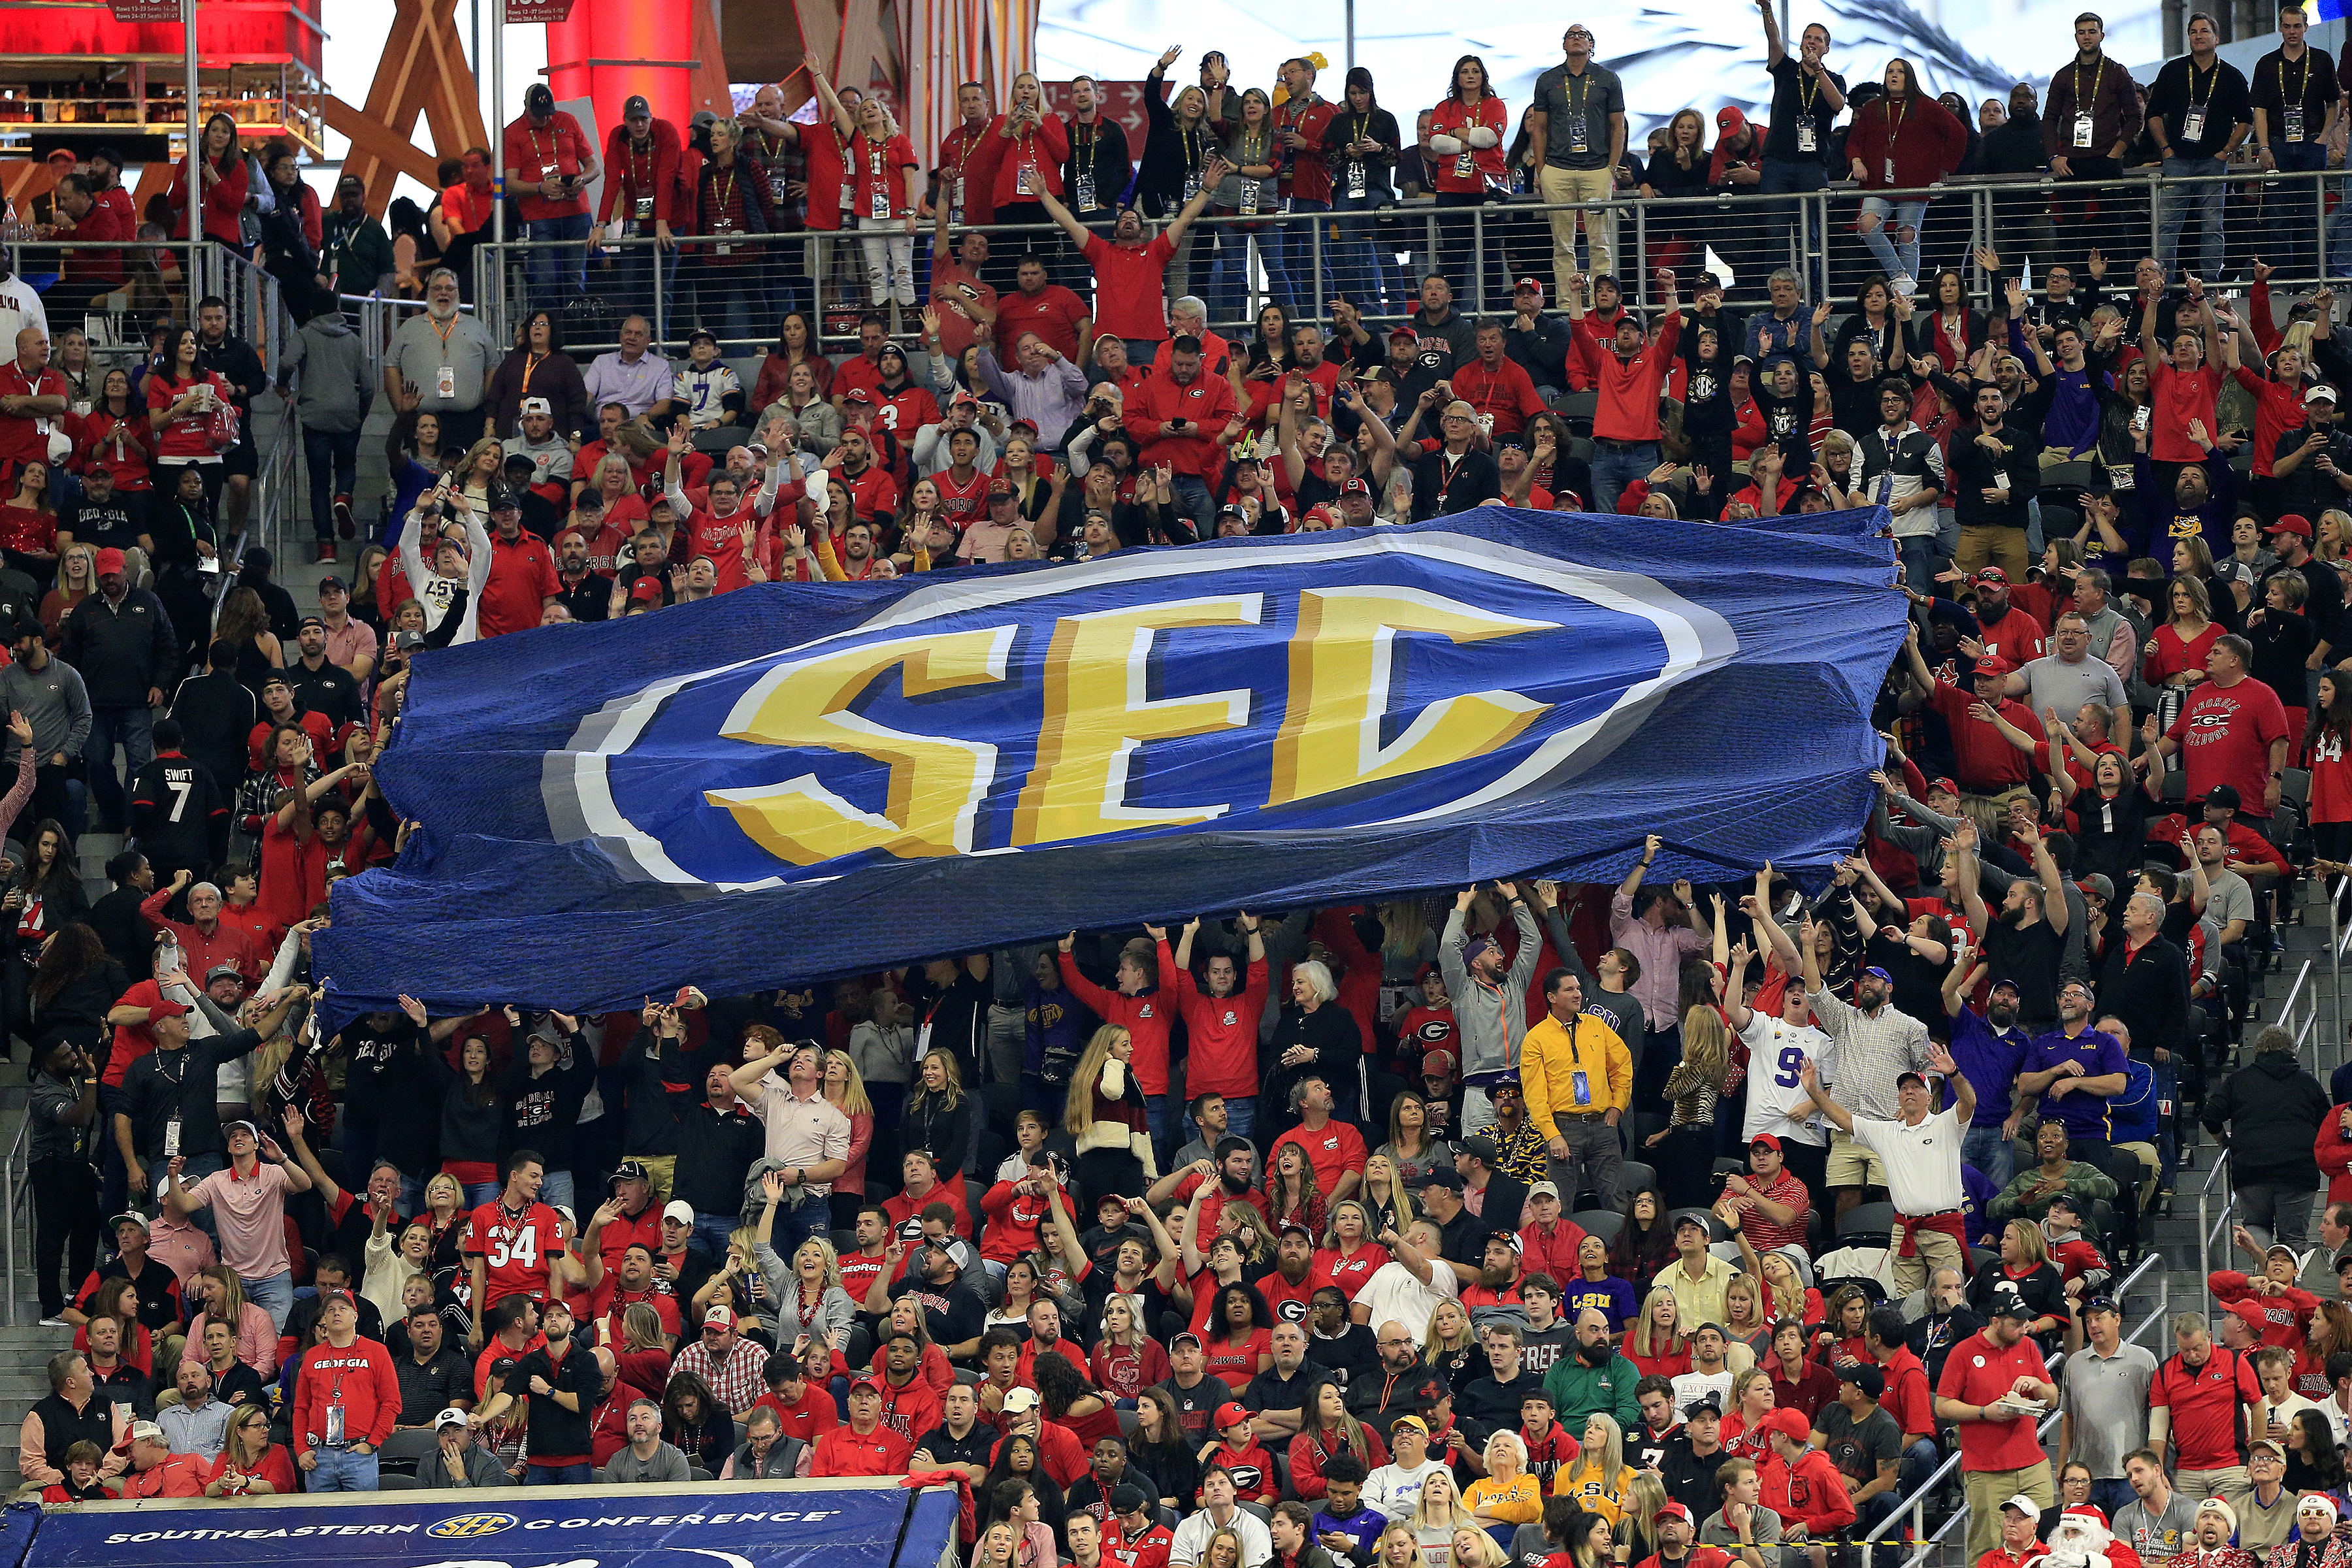 COLLEGE FOOTBALL: DEC 07 SEC Championship Game